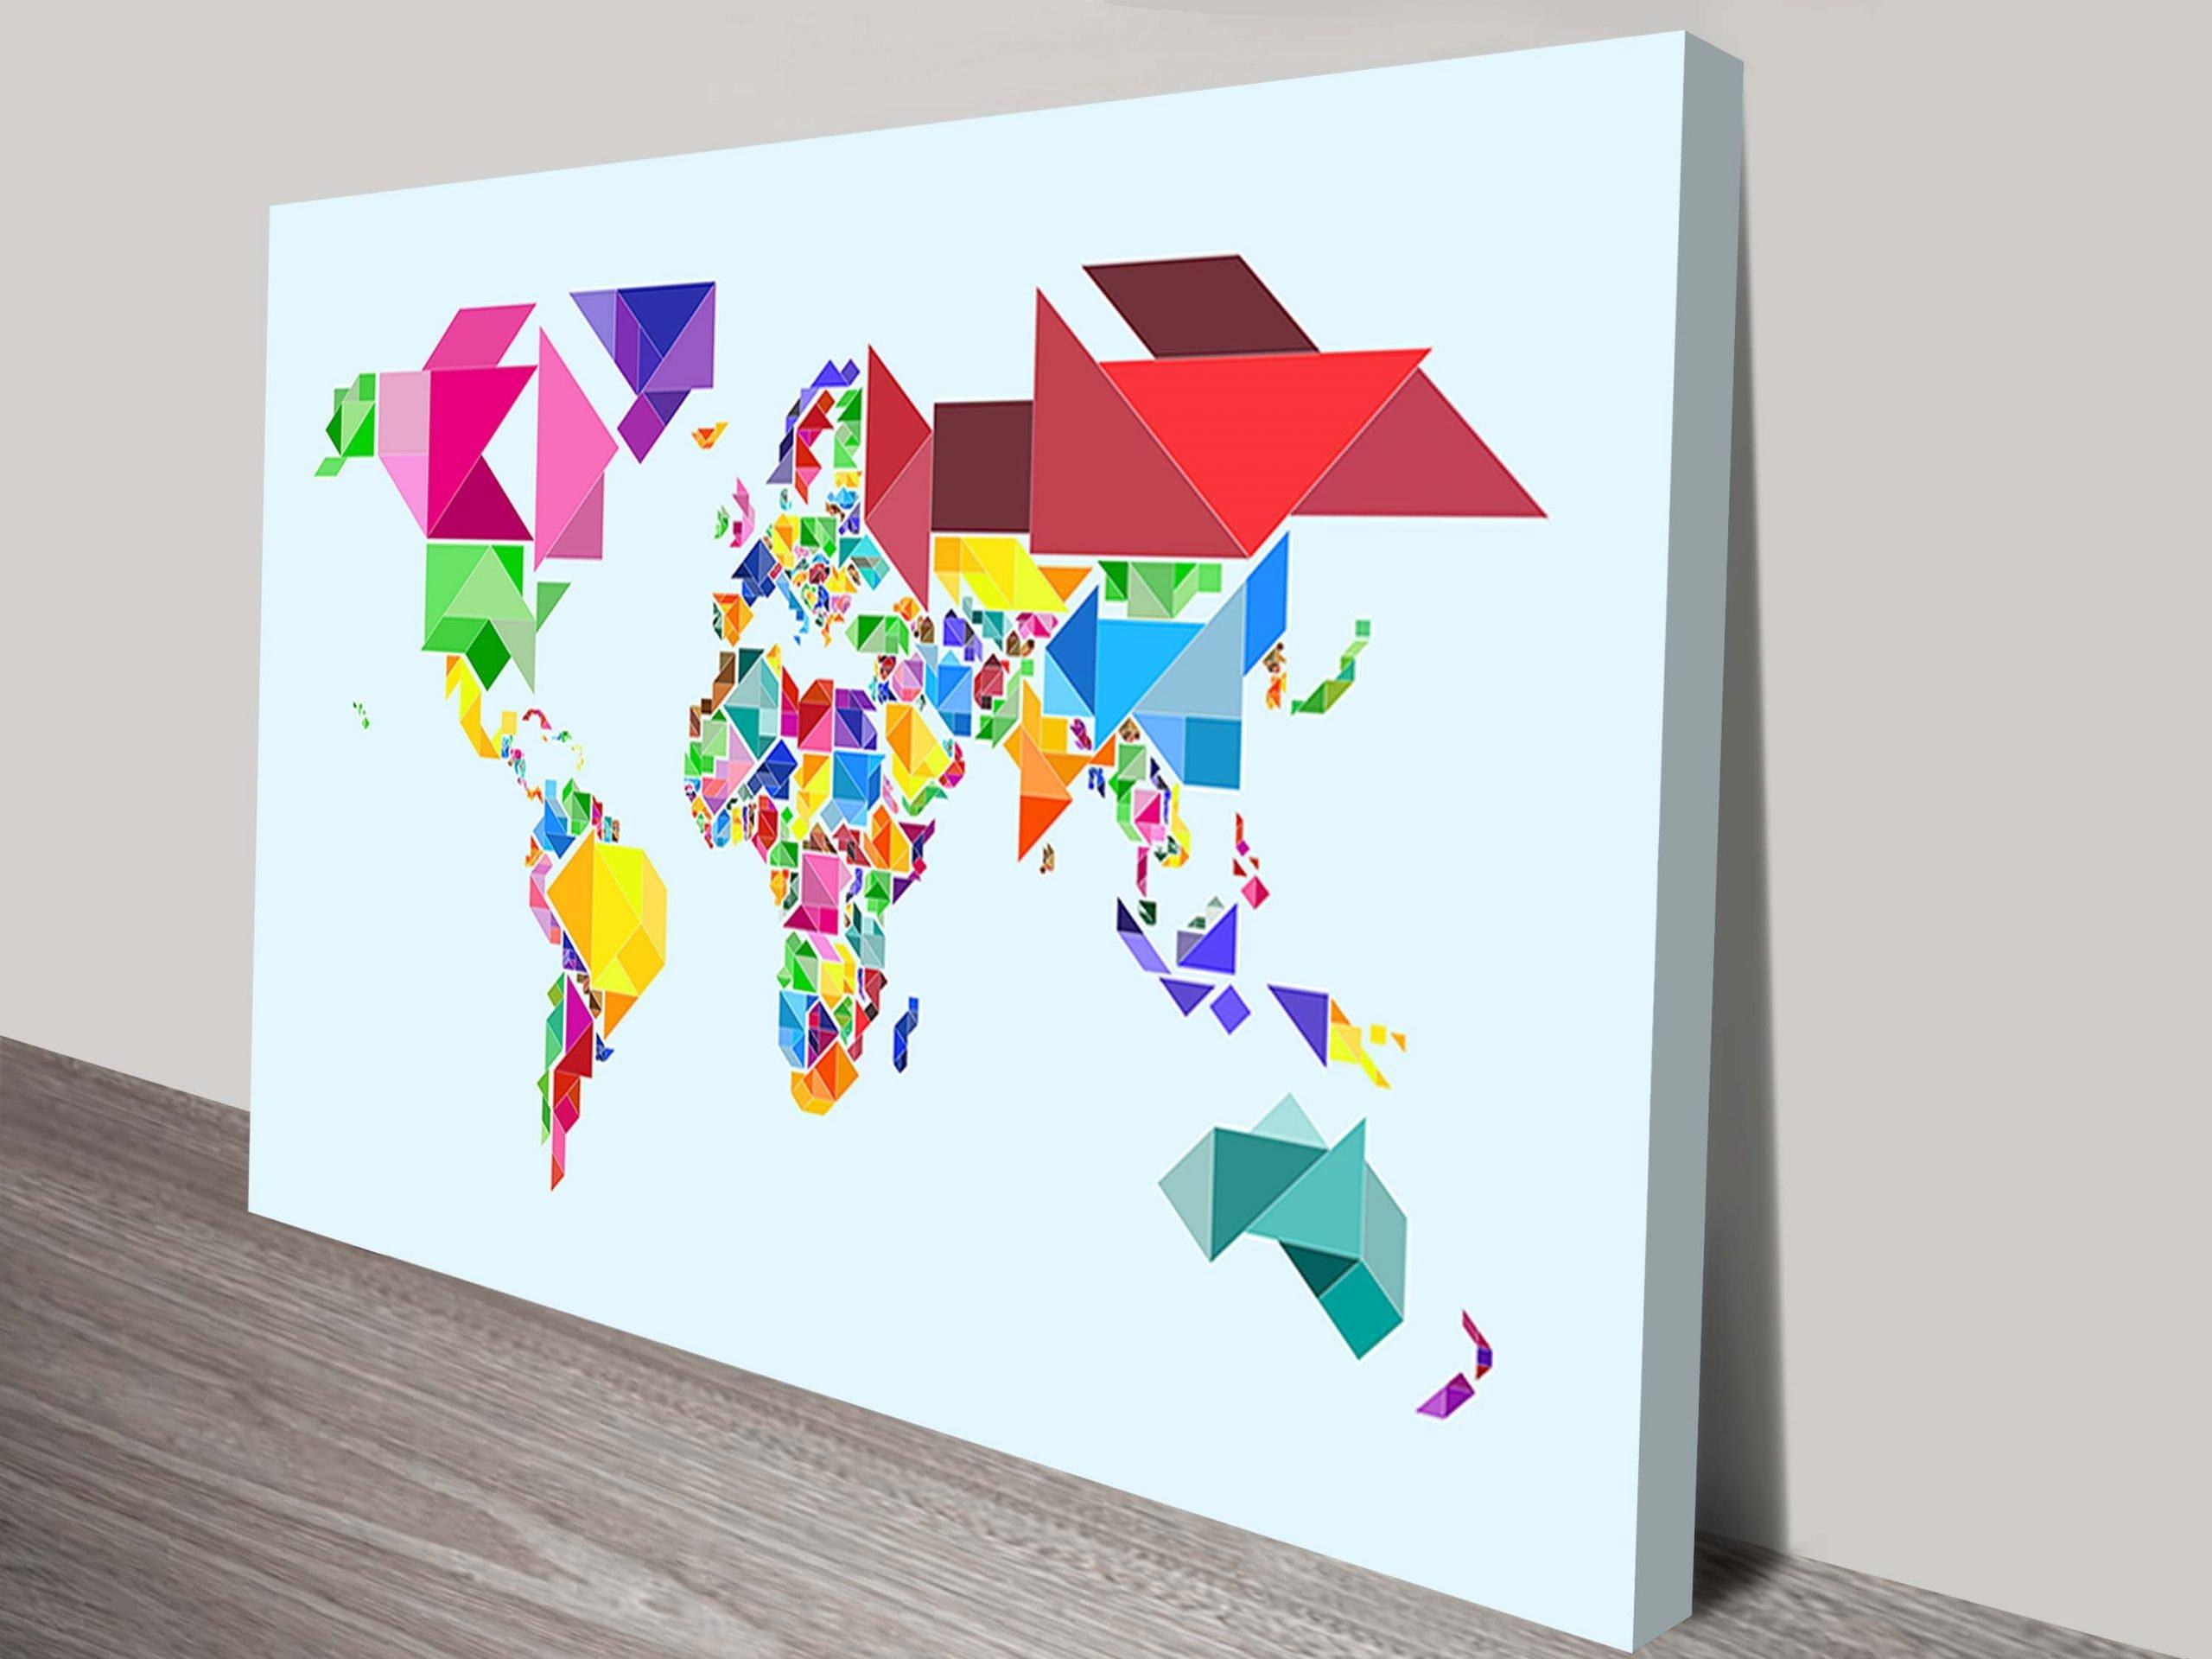 Tangram Abstract World Map Wall Art